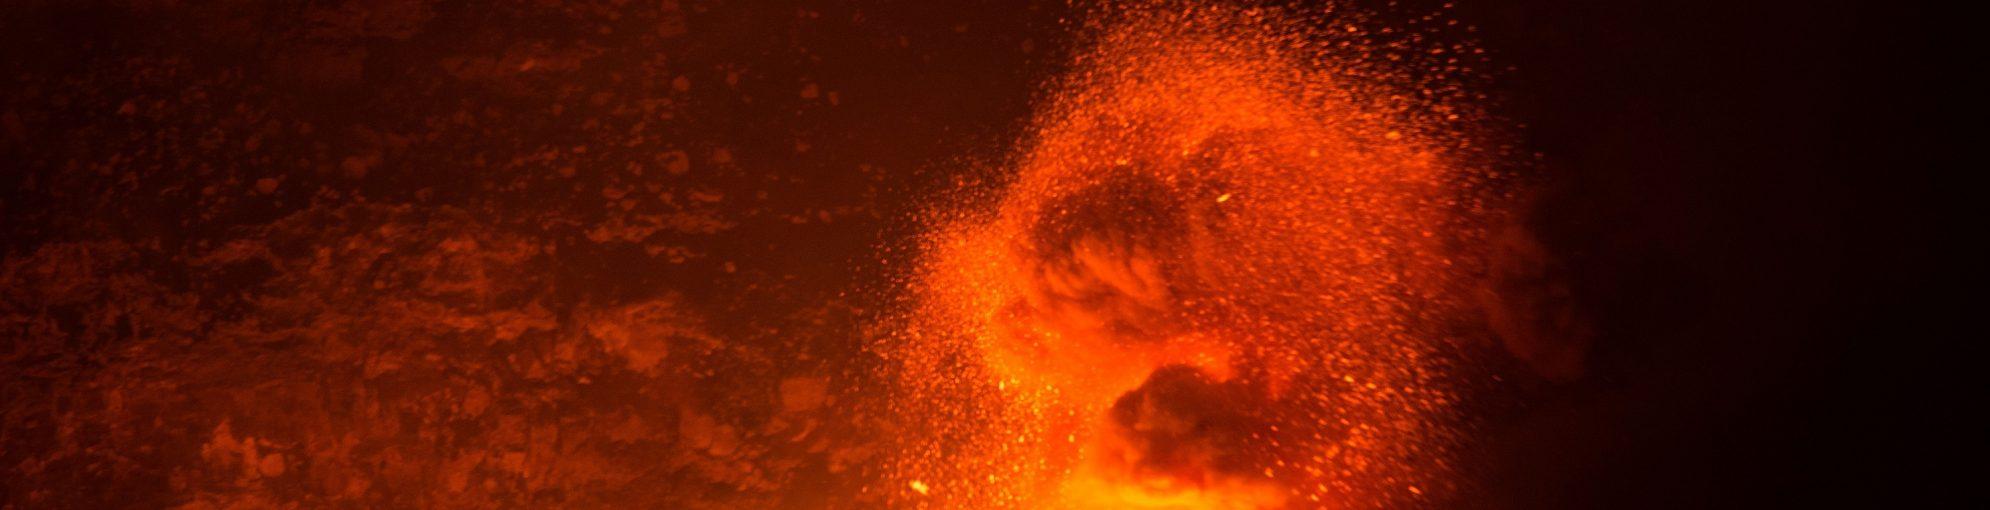 "5th V Collapse Caldera Workshop""Caldera Volcanism and Society"""